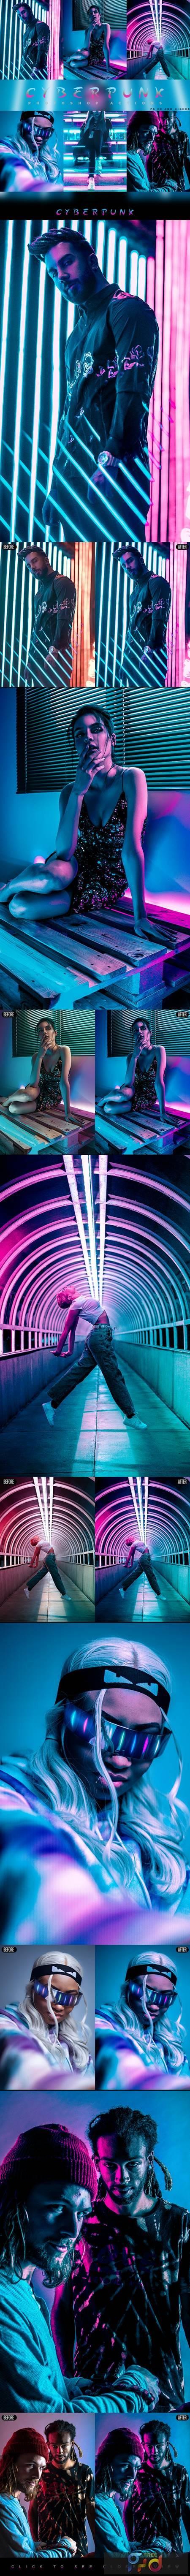 Cyberpunk - Photoshop Action 27556994 1